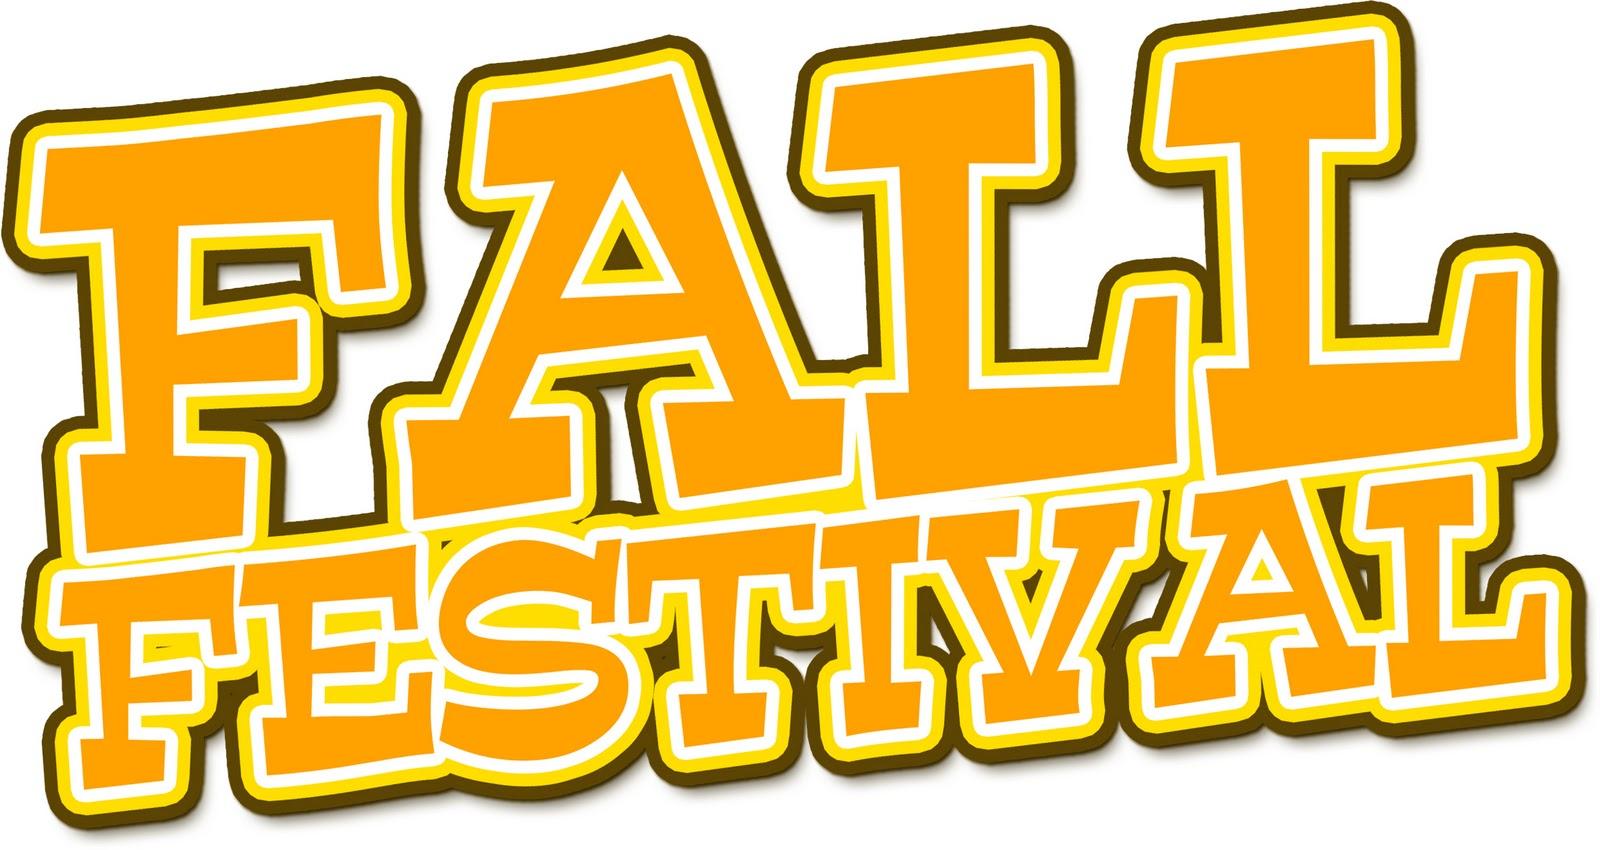 Fall festival community festival clipart